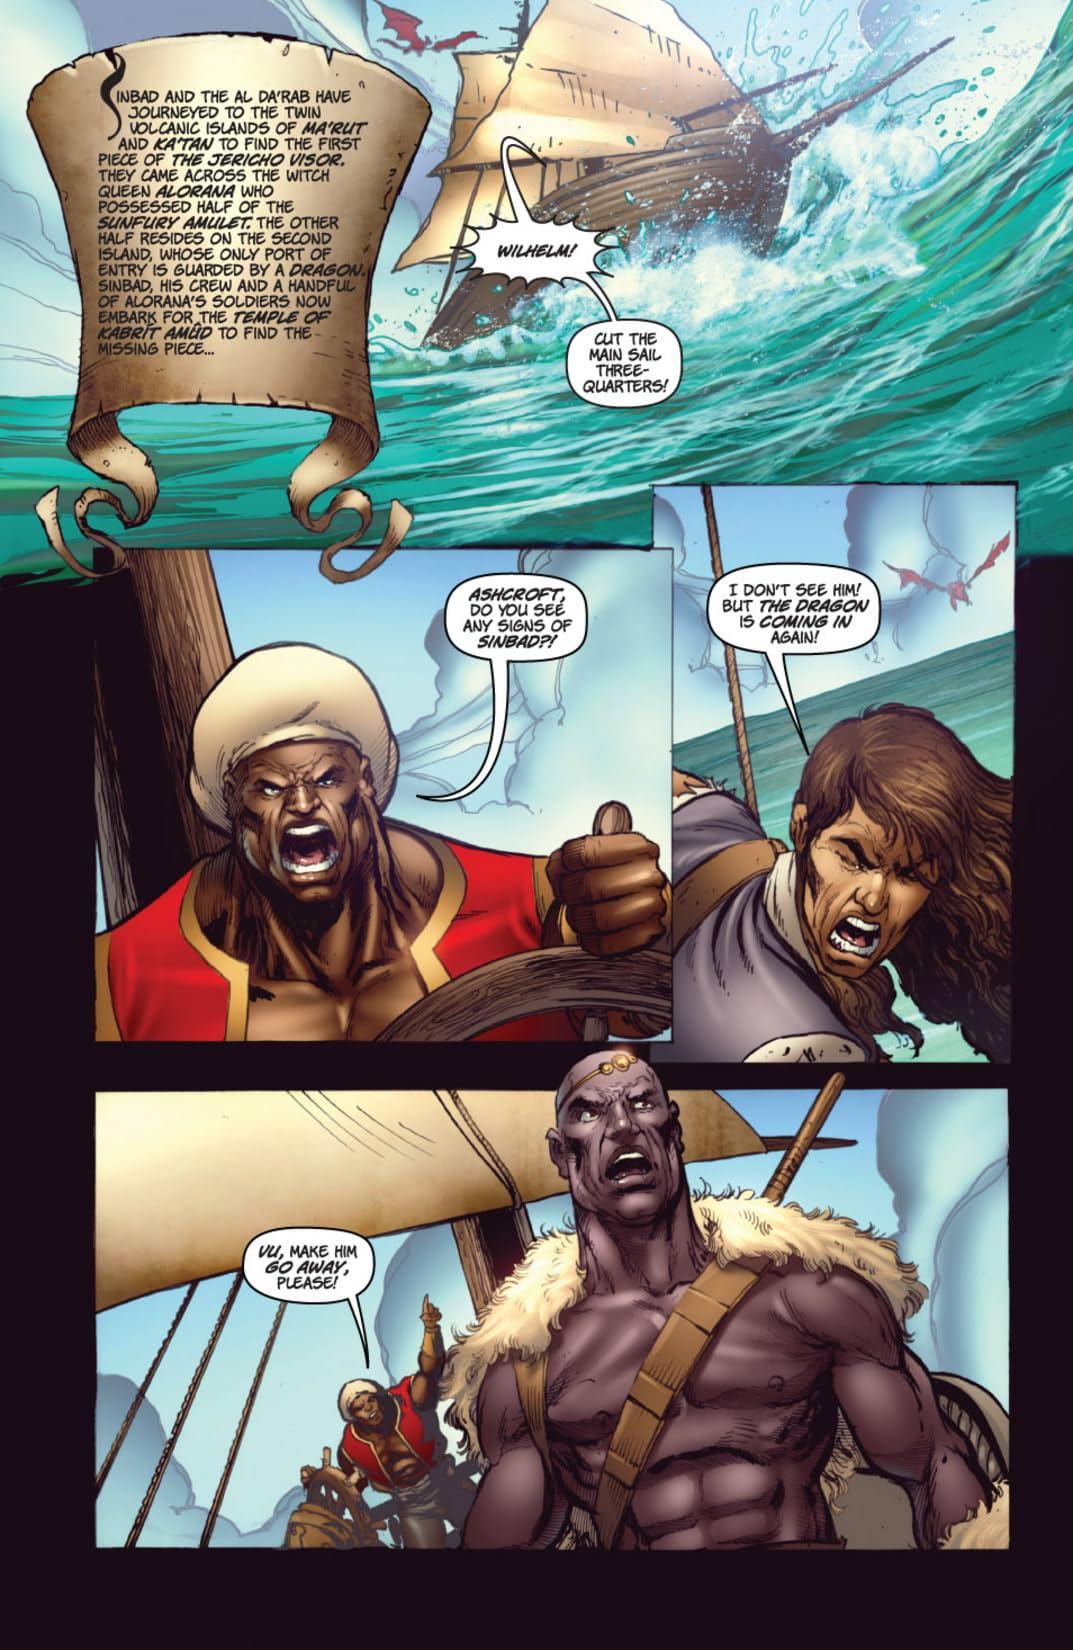 1001 Arabian Nights: The Adventures of Sinbad #3